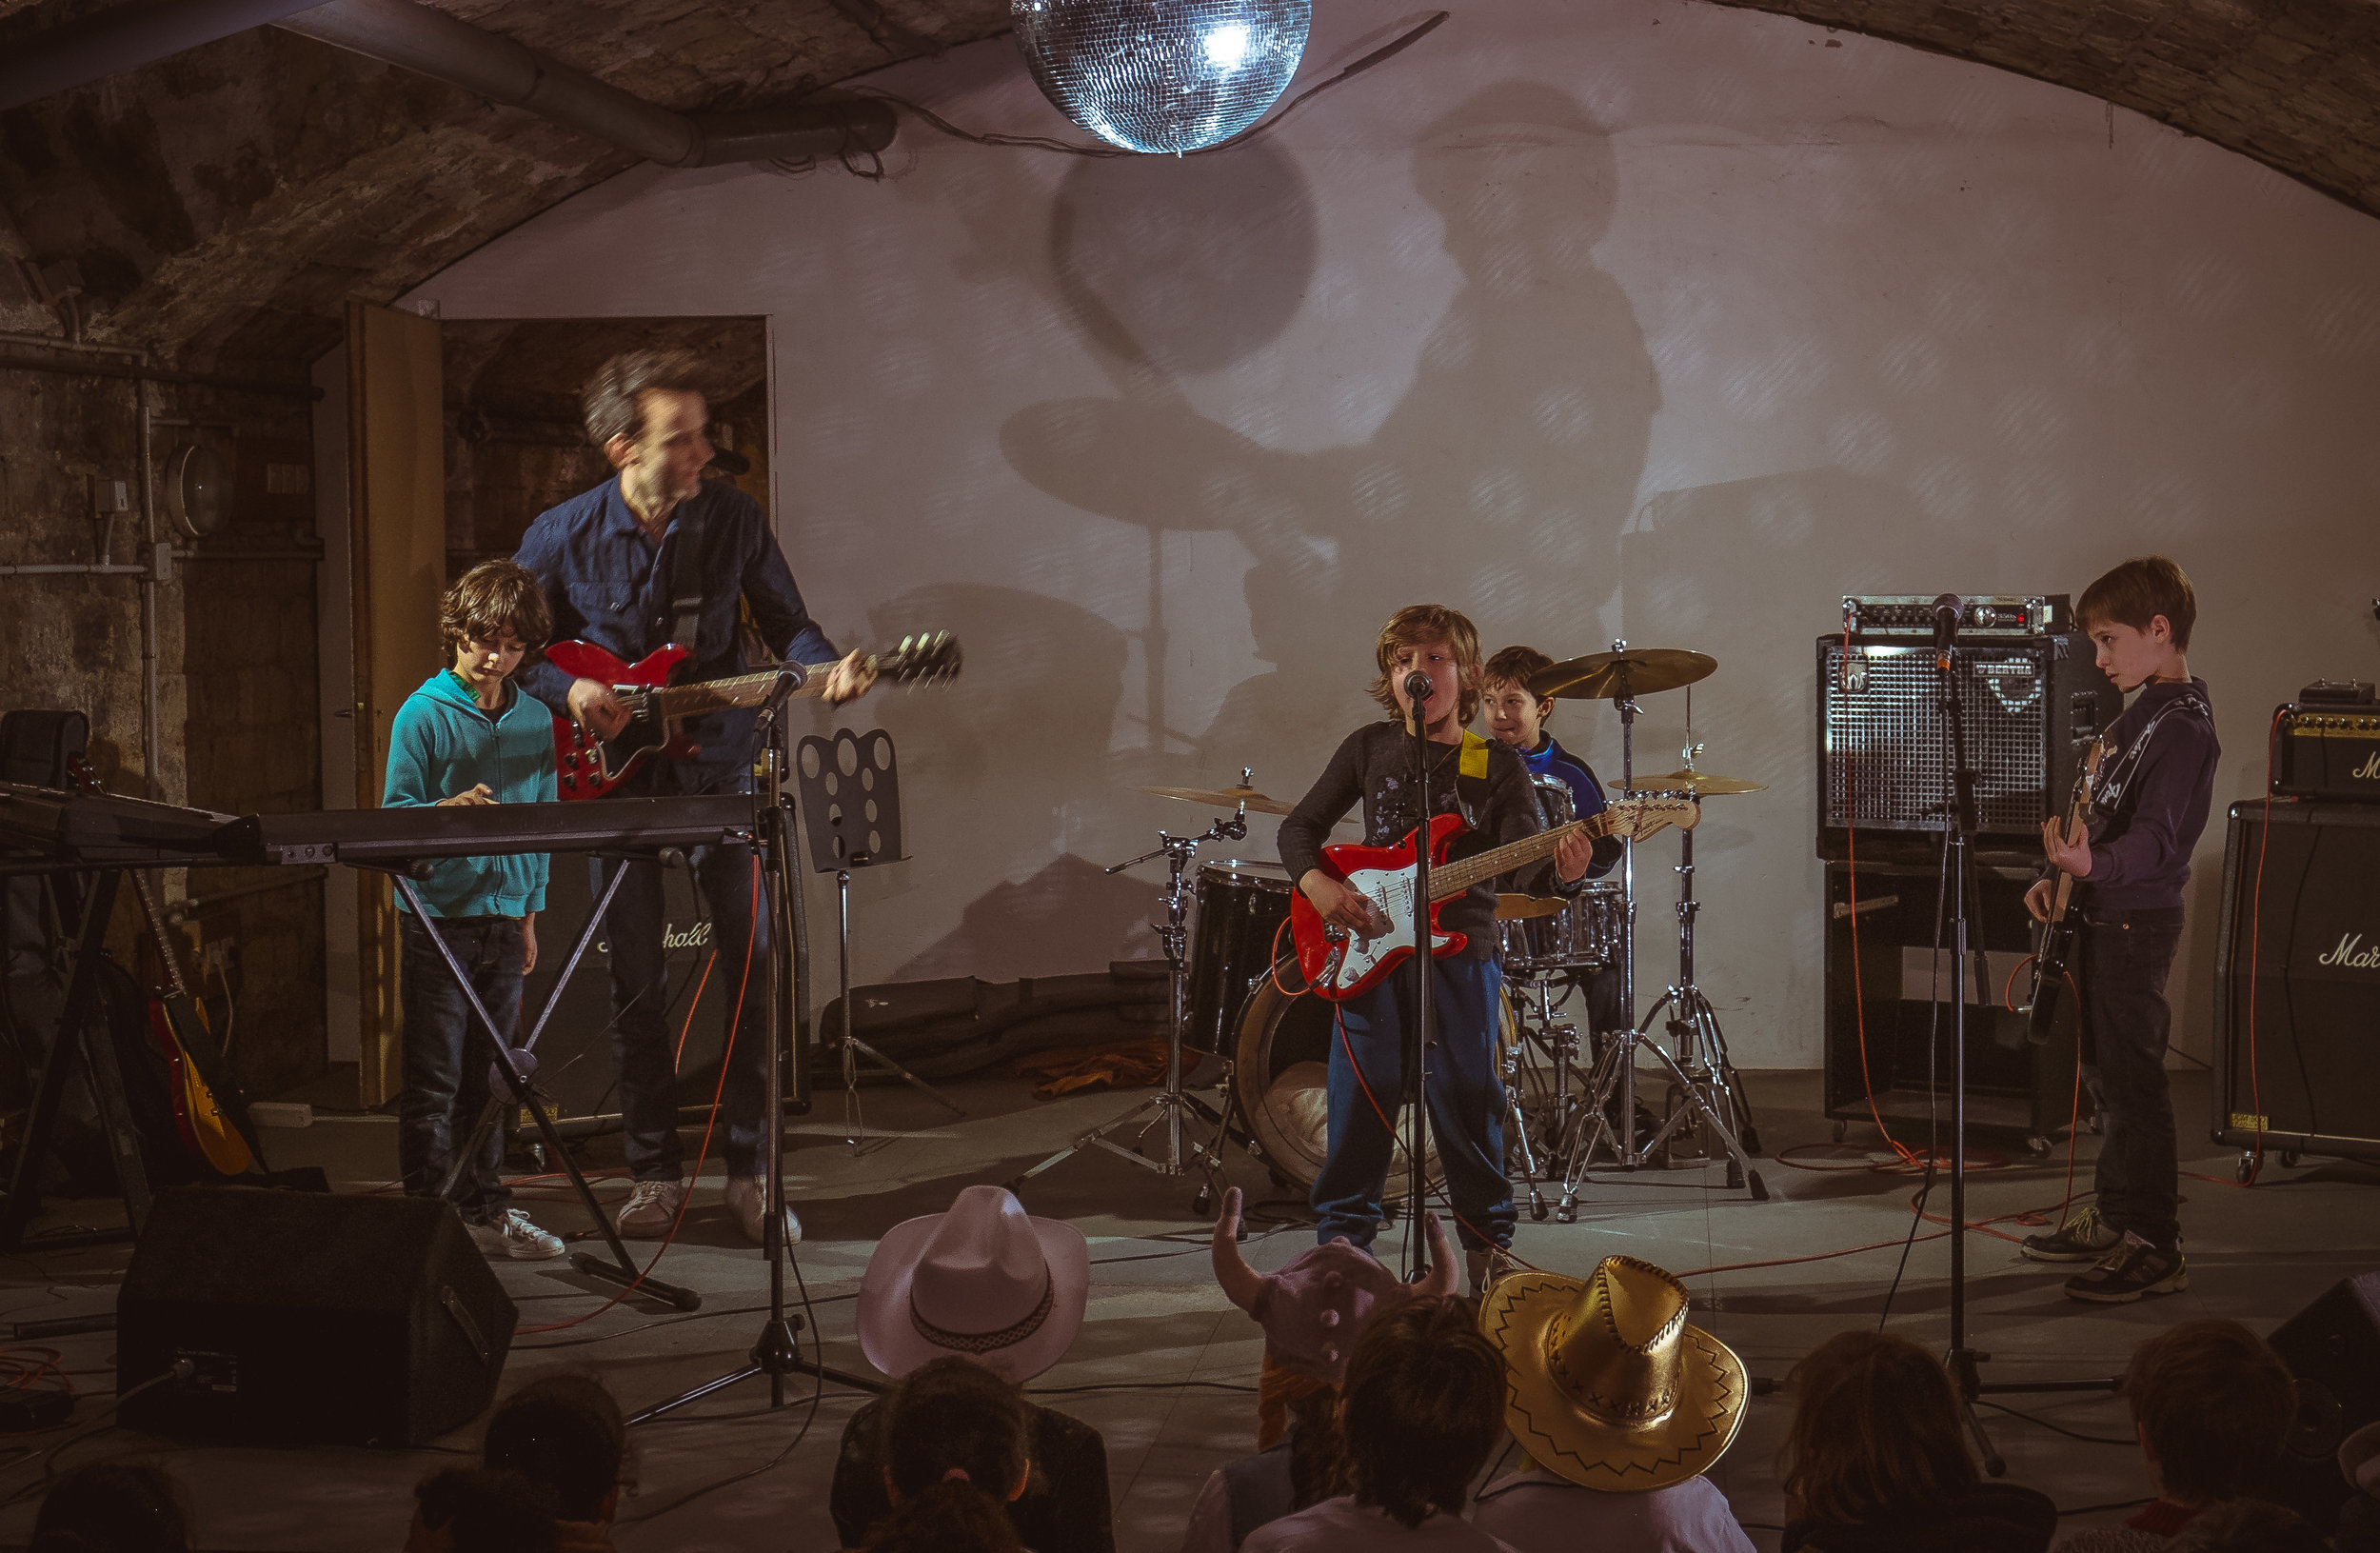 Paris Bandmates Beginner Program Kids Band